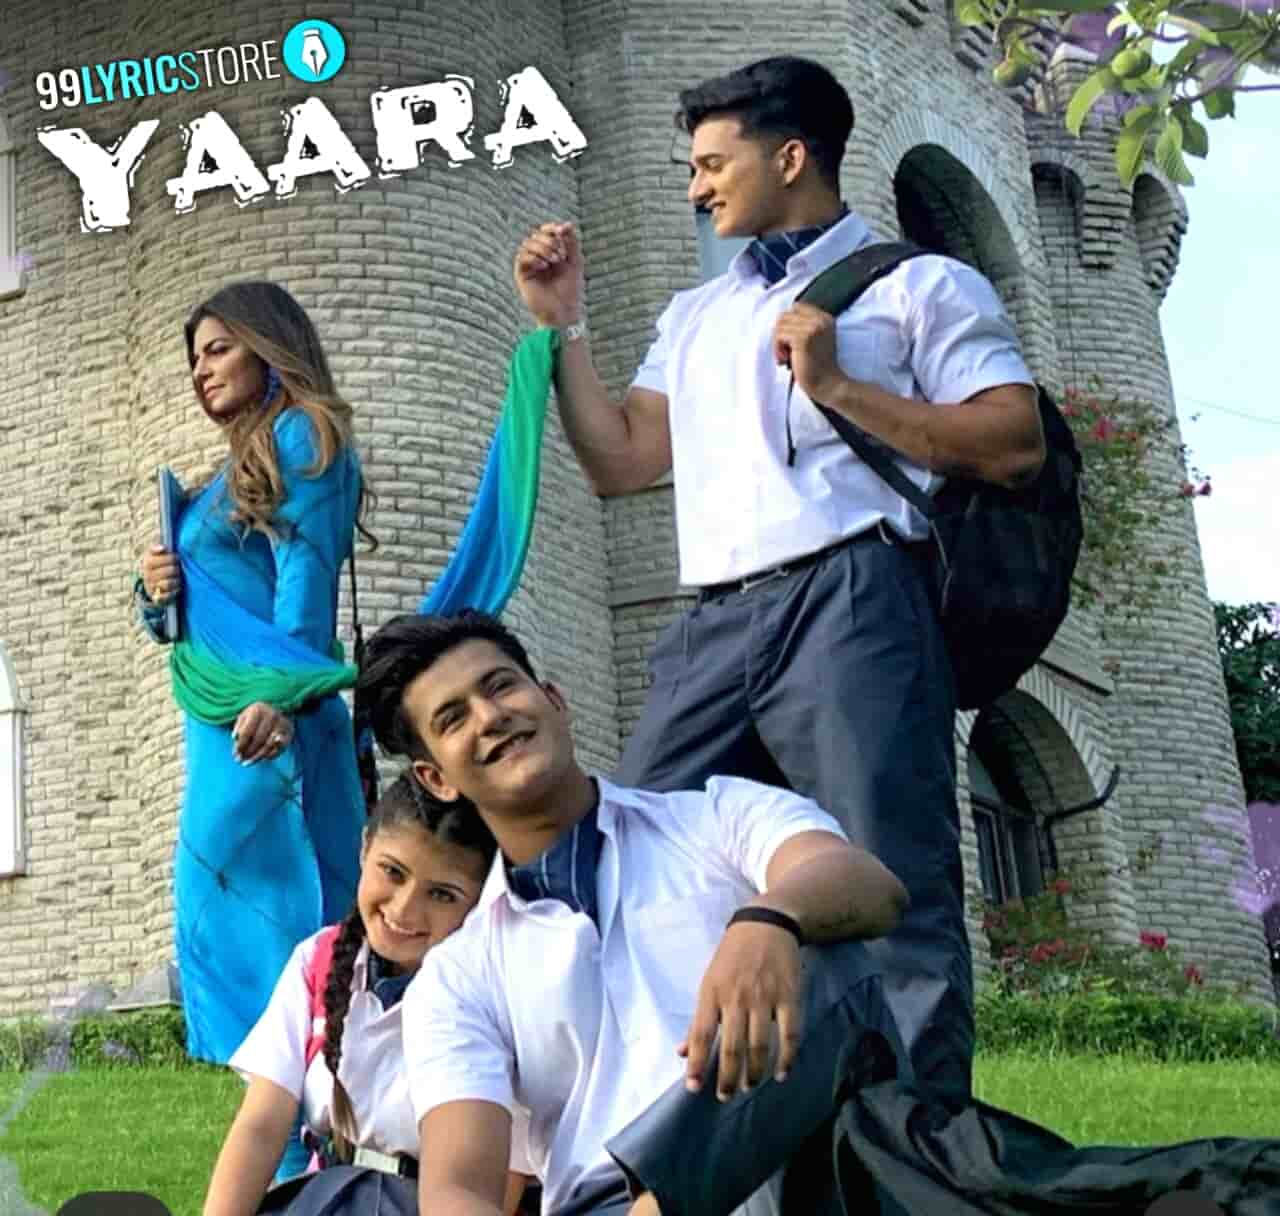 Yaara love Hindi song sung by Mamta Sharma